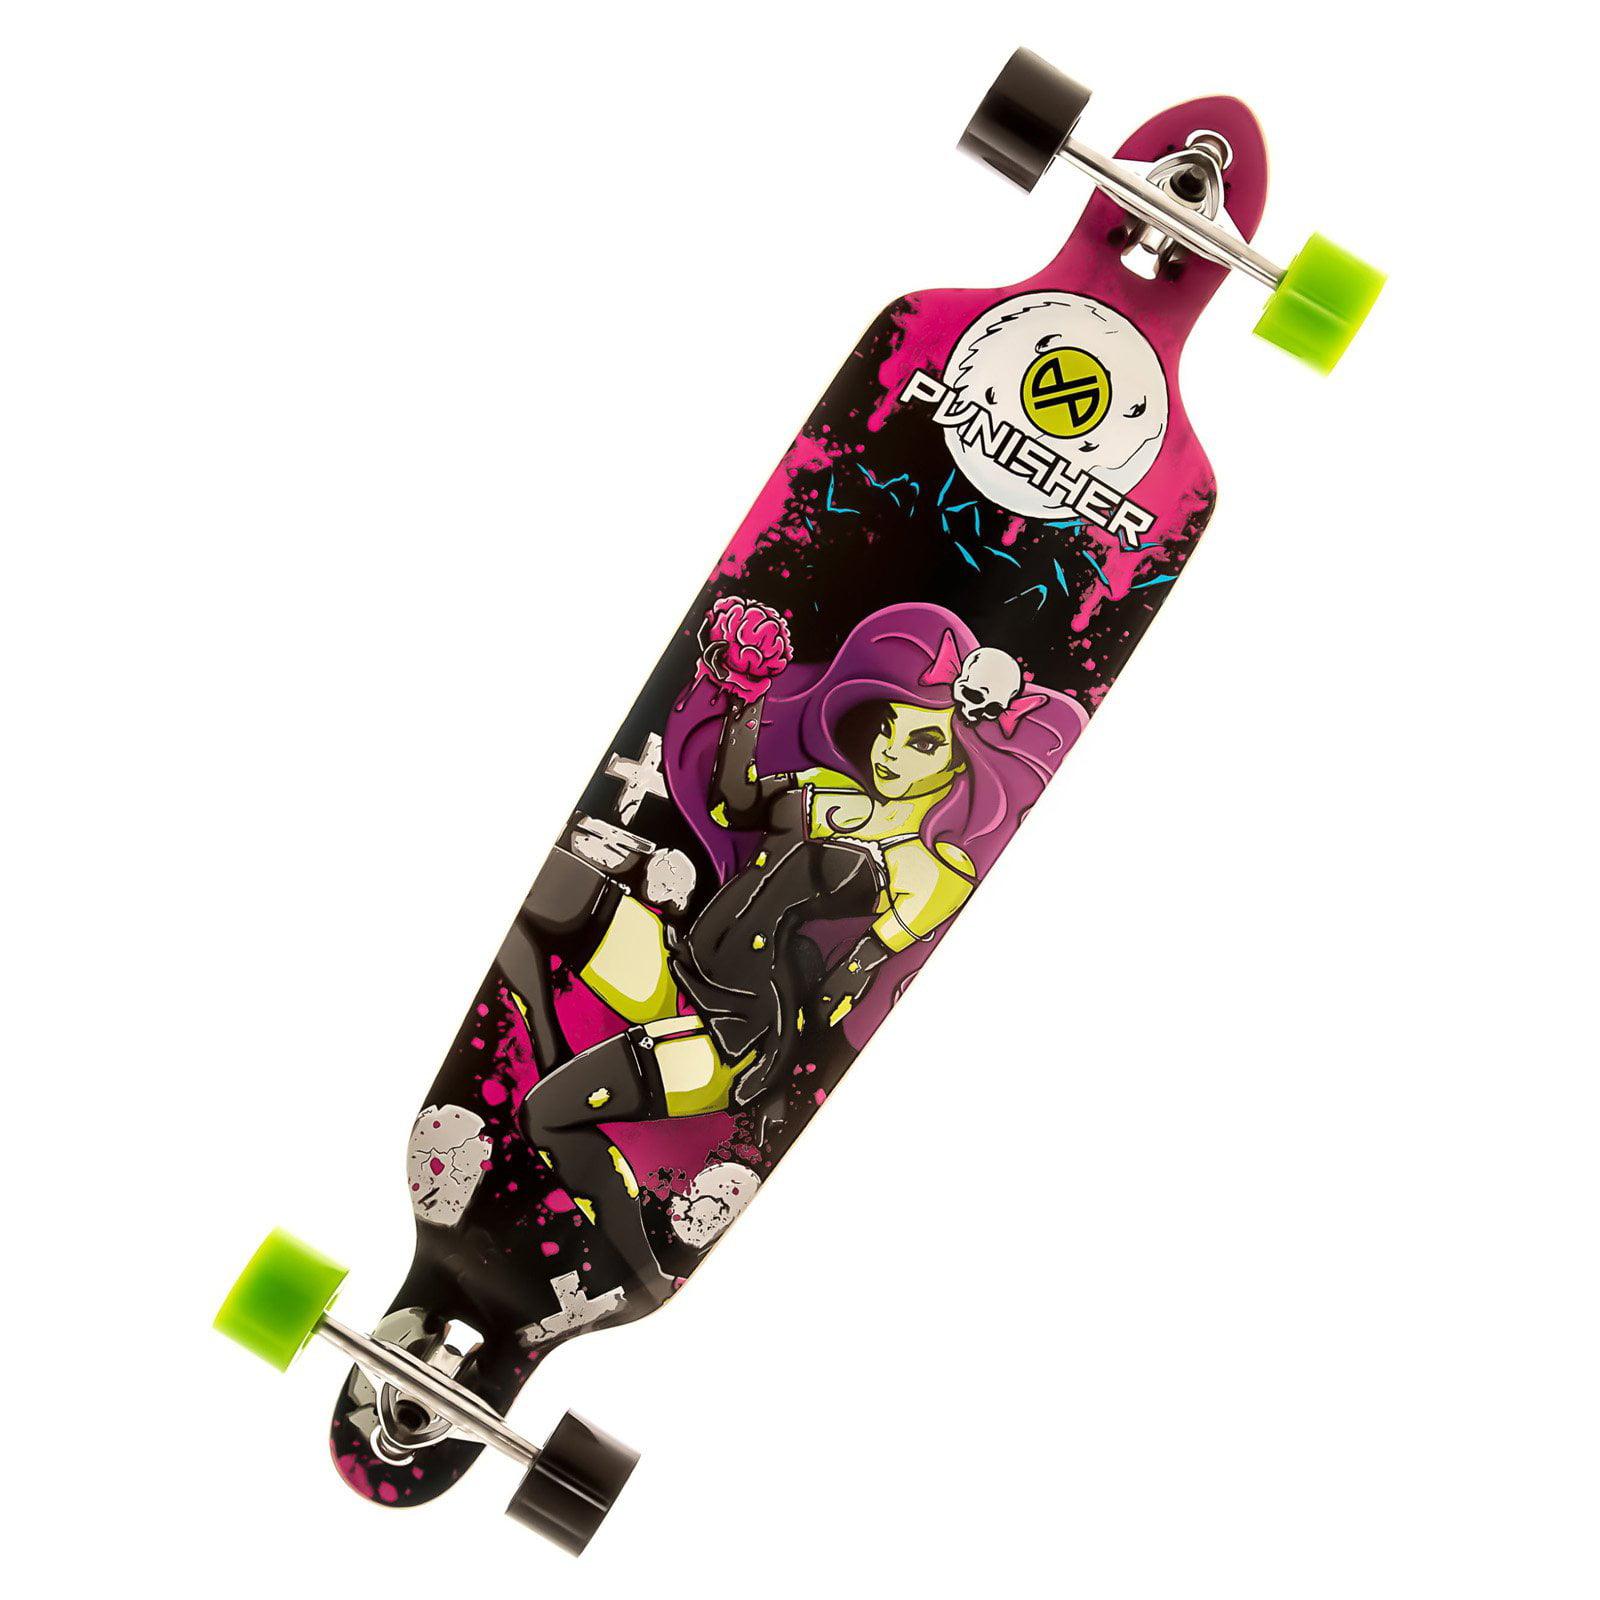 "Punisher Skateboards Zombie 40"" Longboard, Double Kick with Drop Down Deck by Punisher Skateboards"